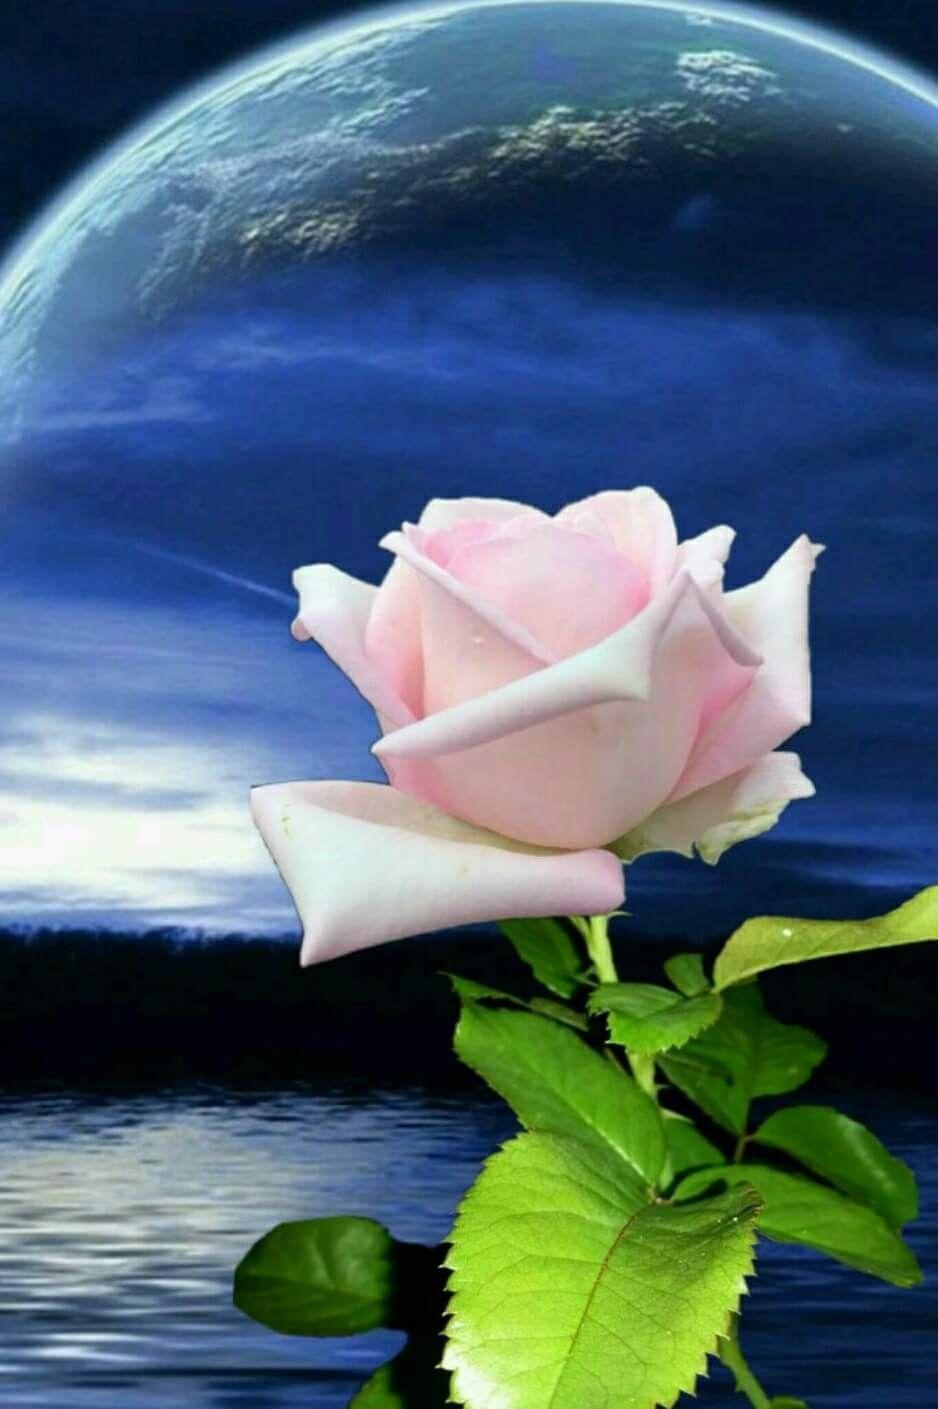 flowerheart pinterest moon discover ideas about beautiful moon izmirmasajfo